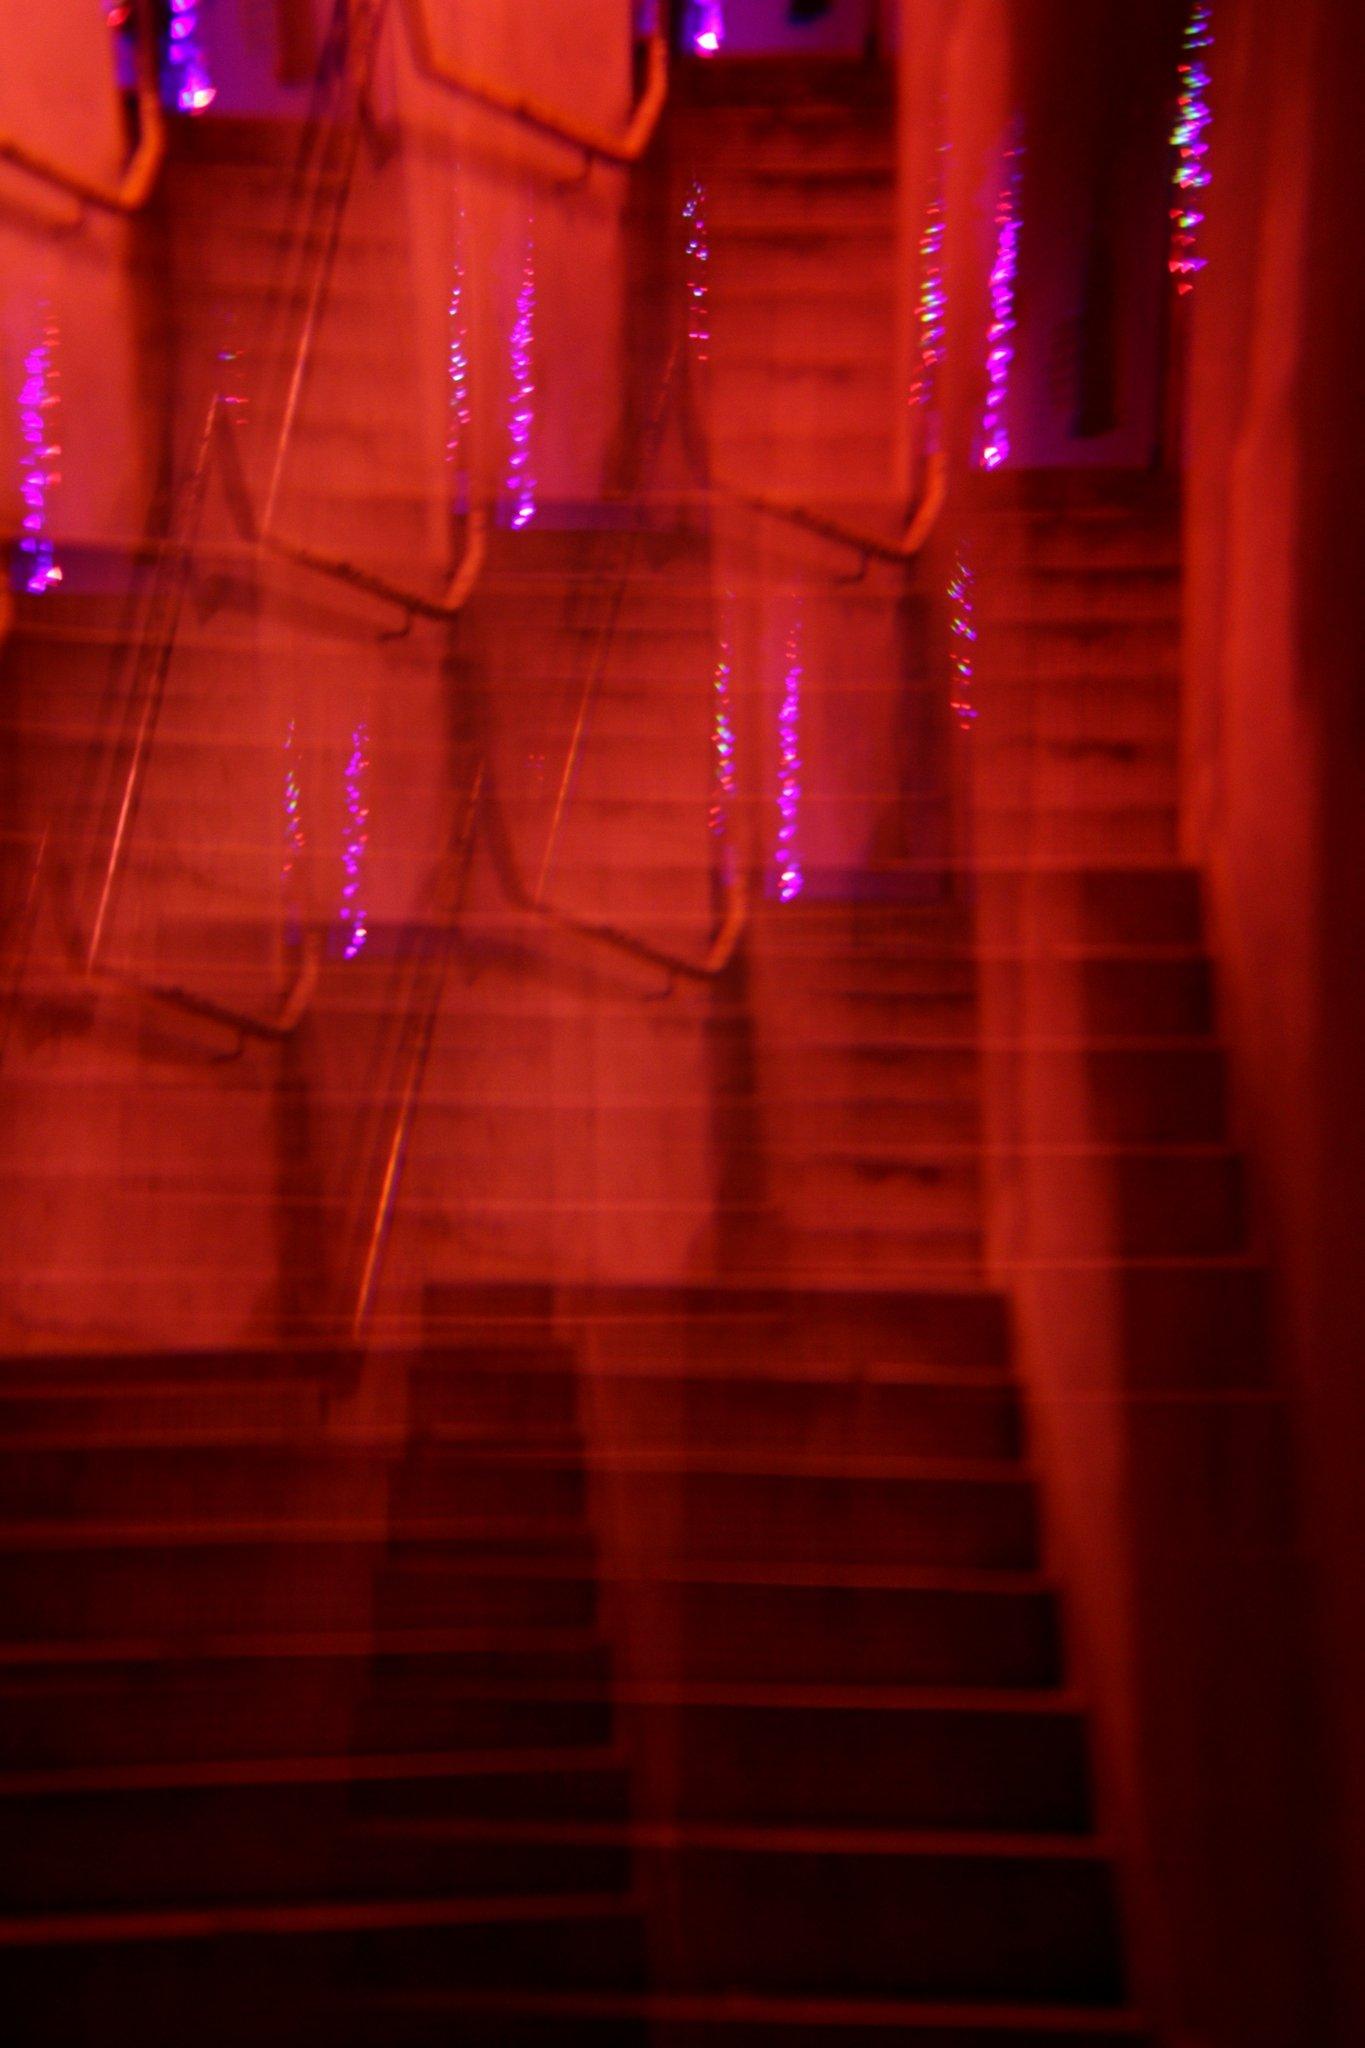 13. StairwayToHeaven